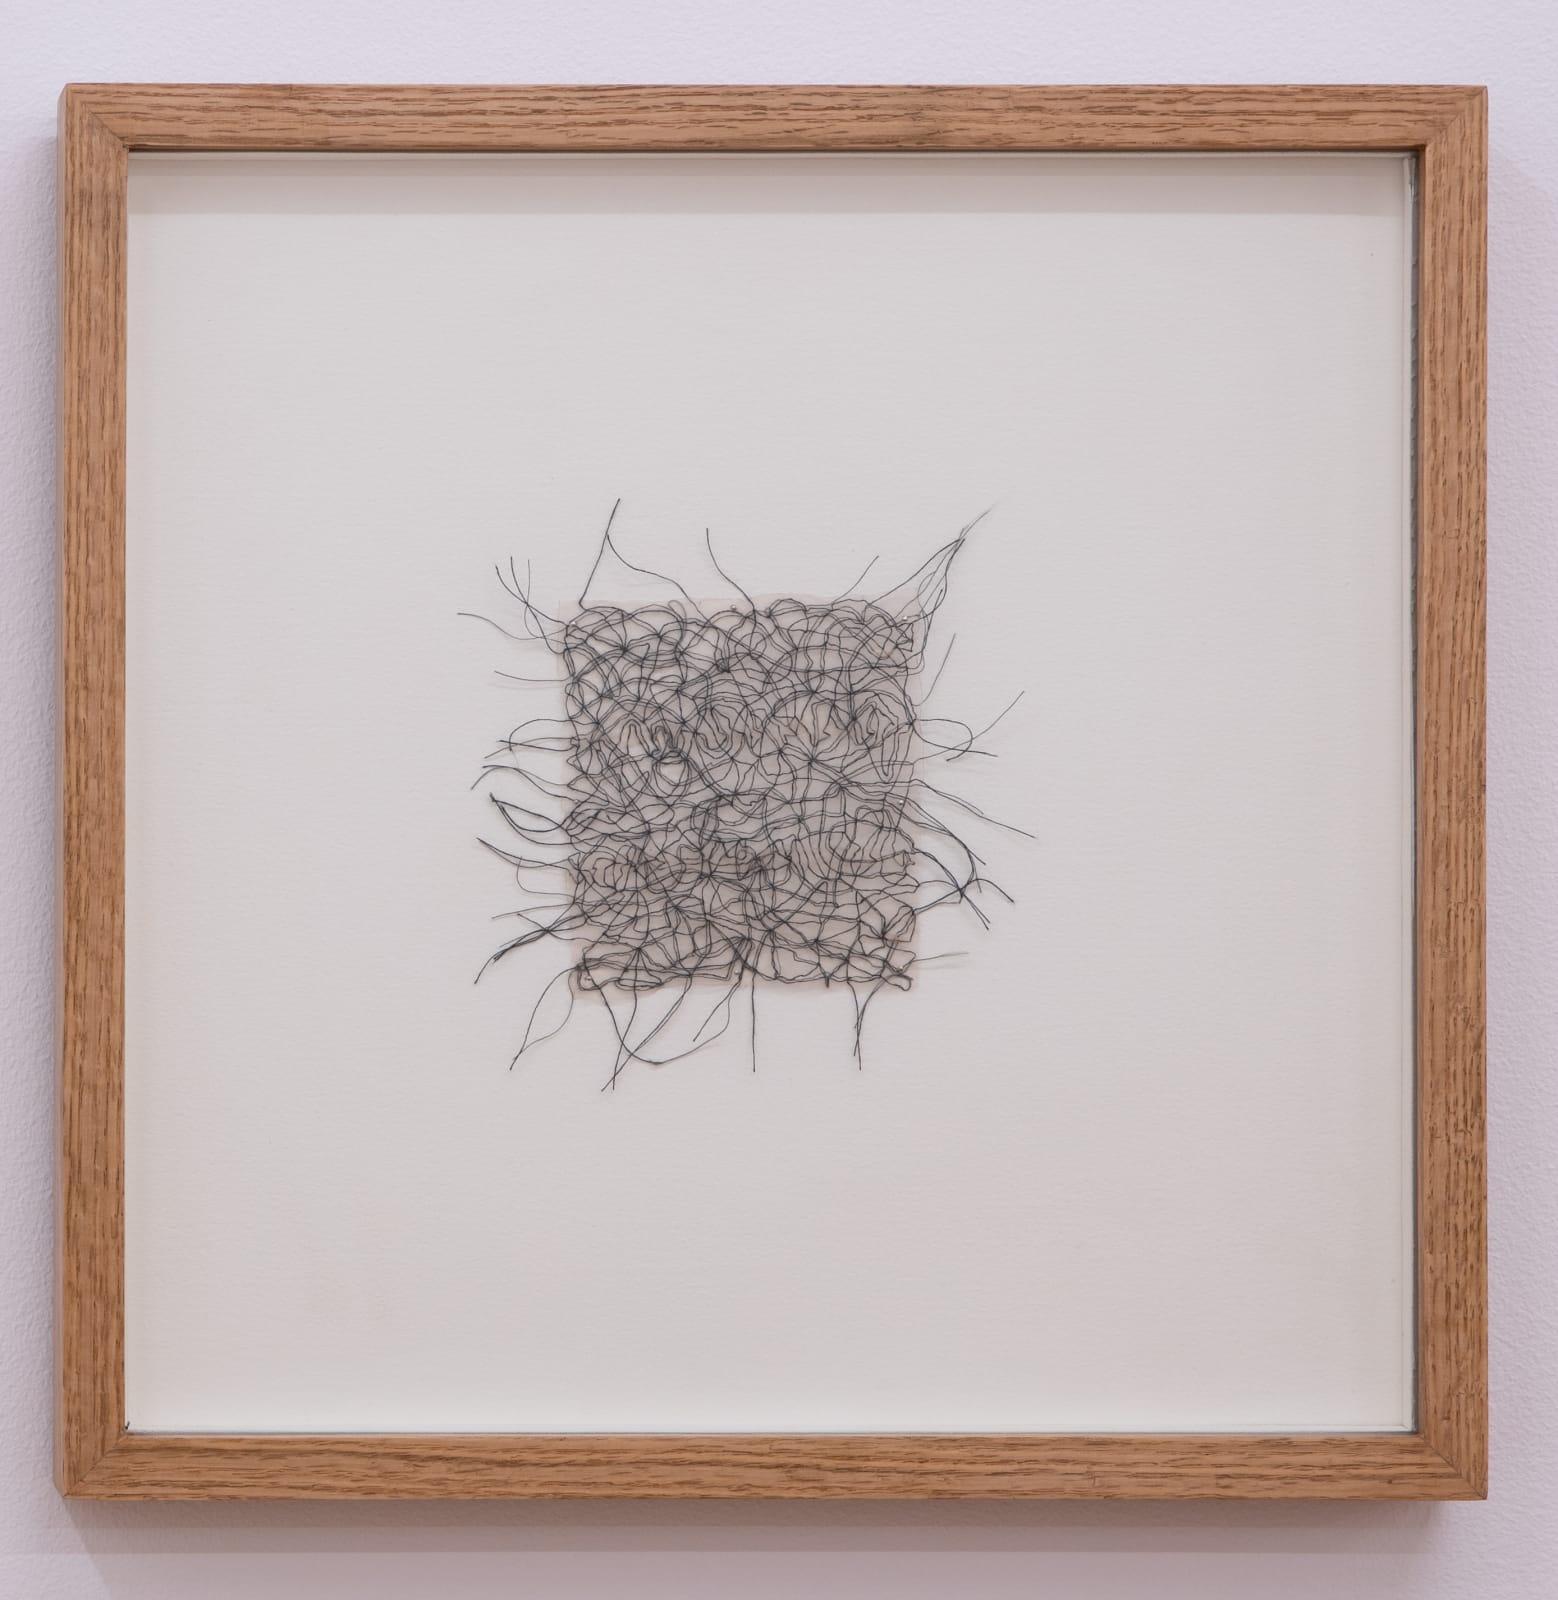 Huda Lutfi, Untitled, 2020-2021